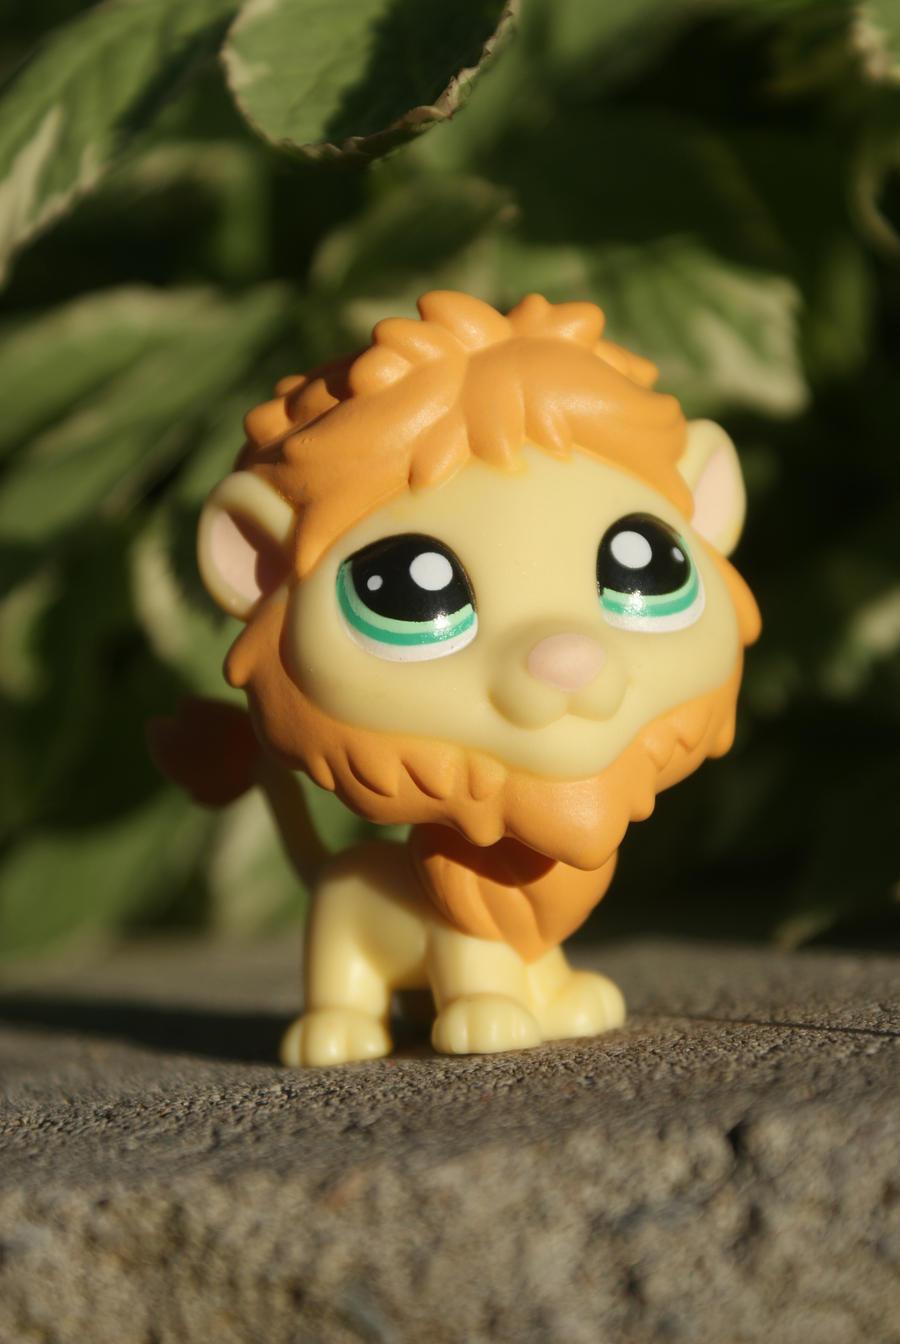 LPS lion by Eli102 on DeviantArt: eli102.deviantart.com/art/LPS-lion-245047967